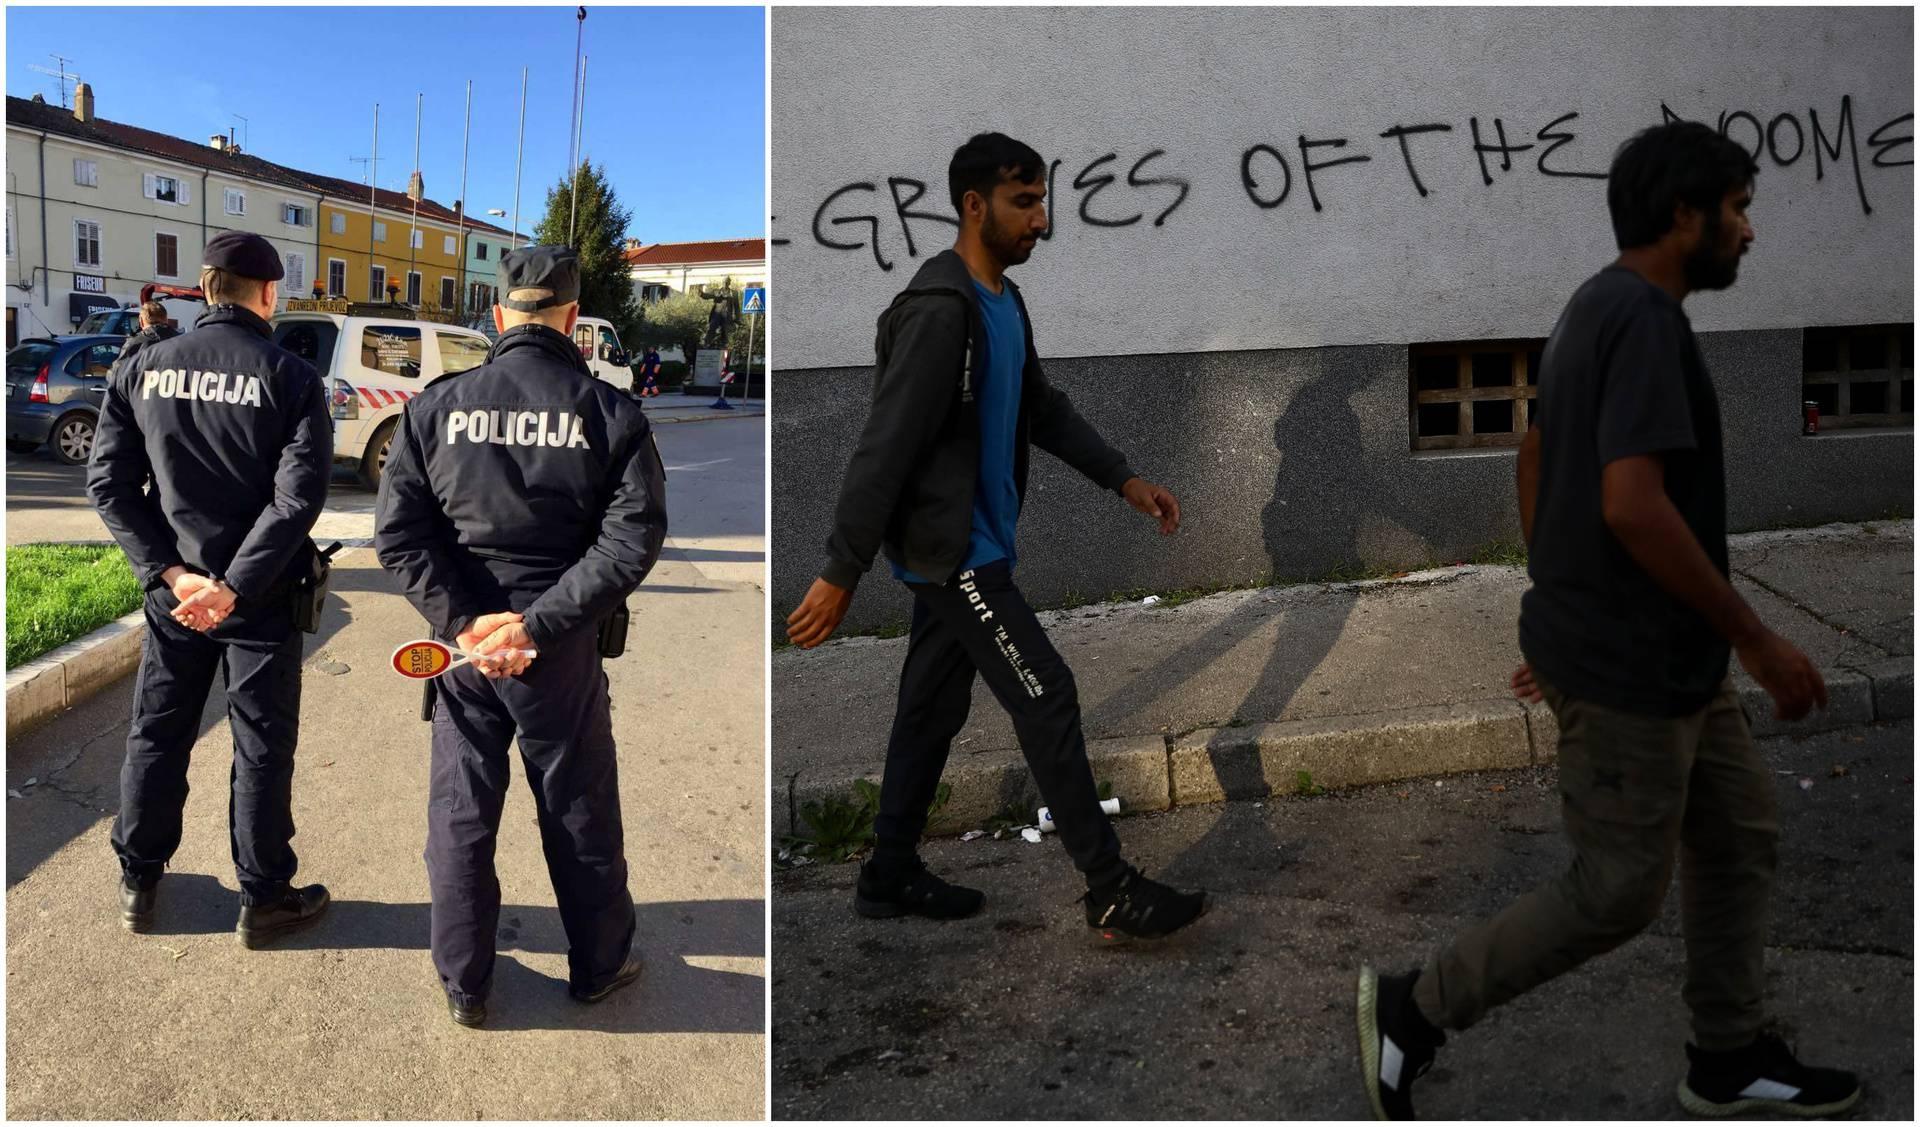 'Poslić' od 5000 eura: Busom vozio 90 migranata u Sloveniju, neke smjestio u prtljažnik